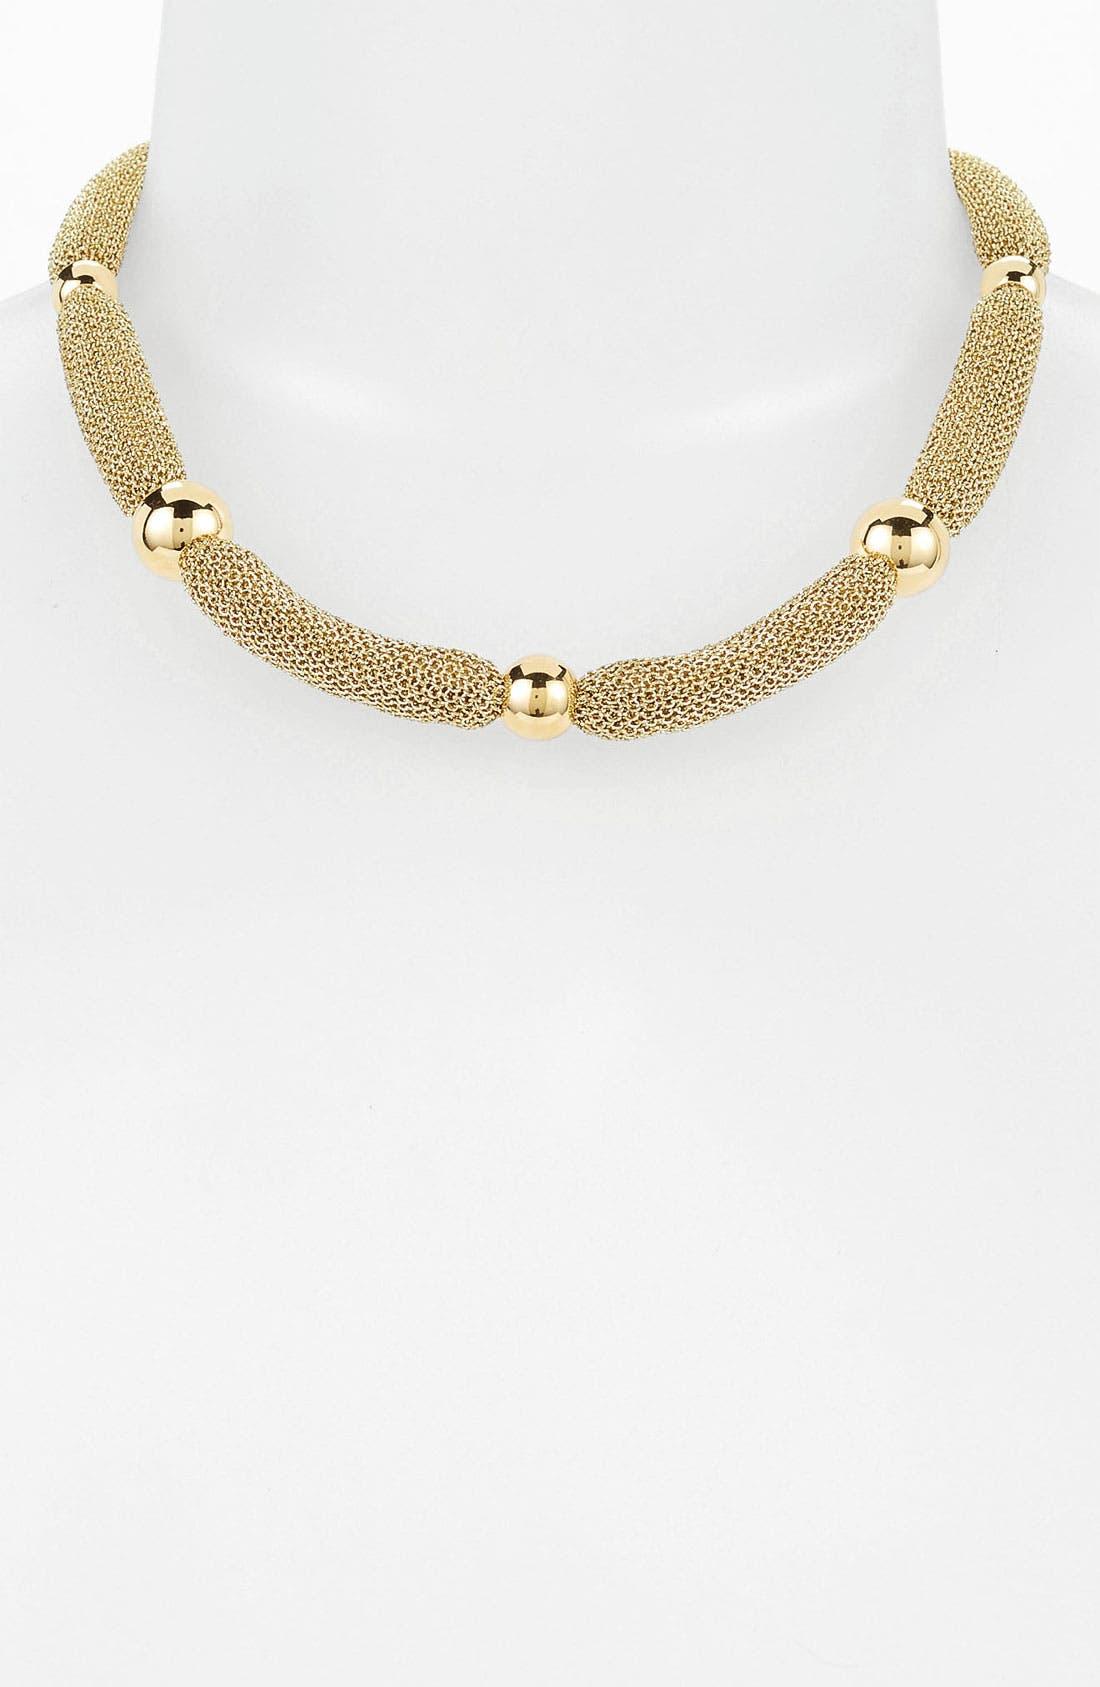 Alternate Image 1 Selected - Adami & Martucci 'Mesh' Collar Necklace